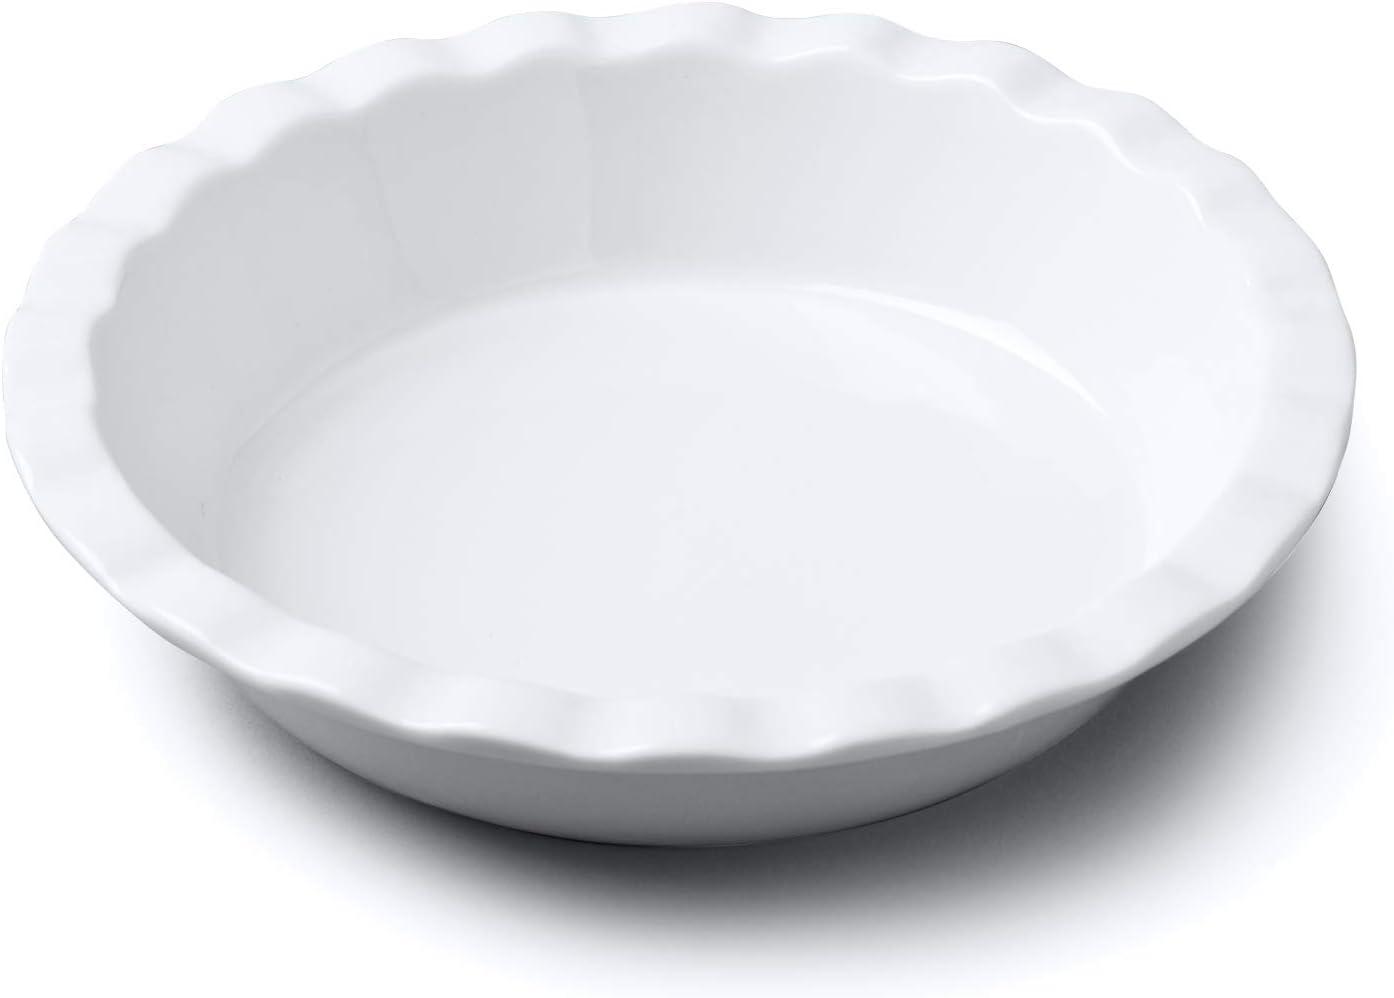 WM Bartleet & Sons 1750 Crinkle Rim Pie Dish, White